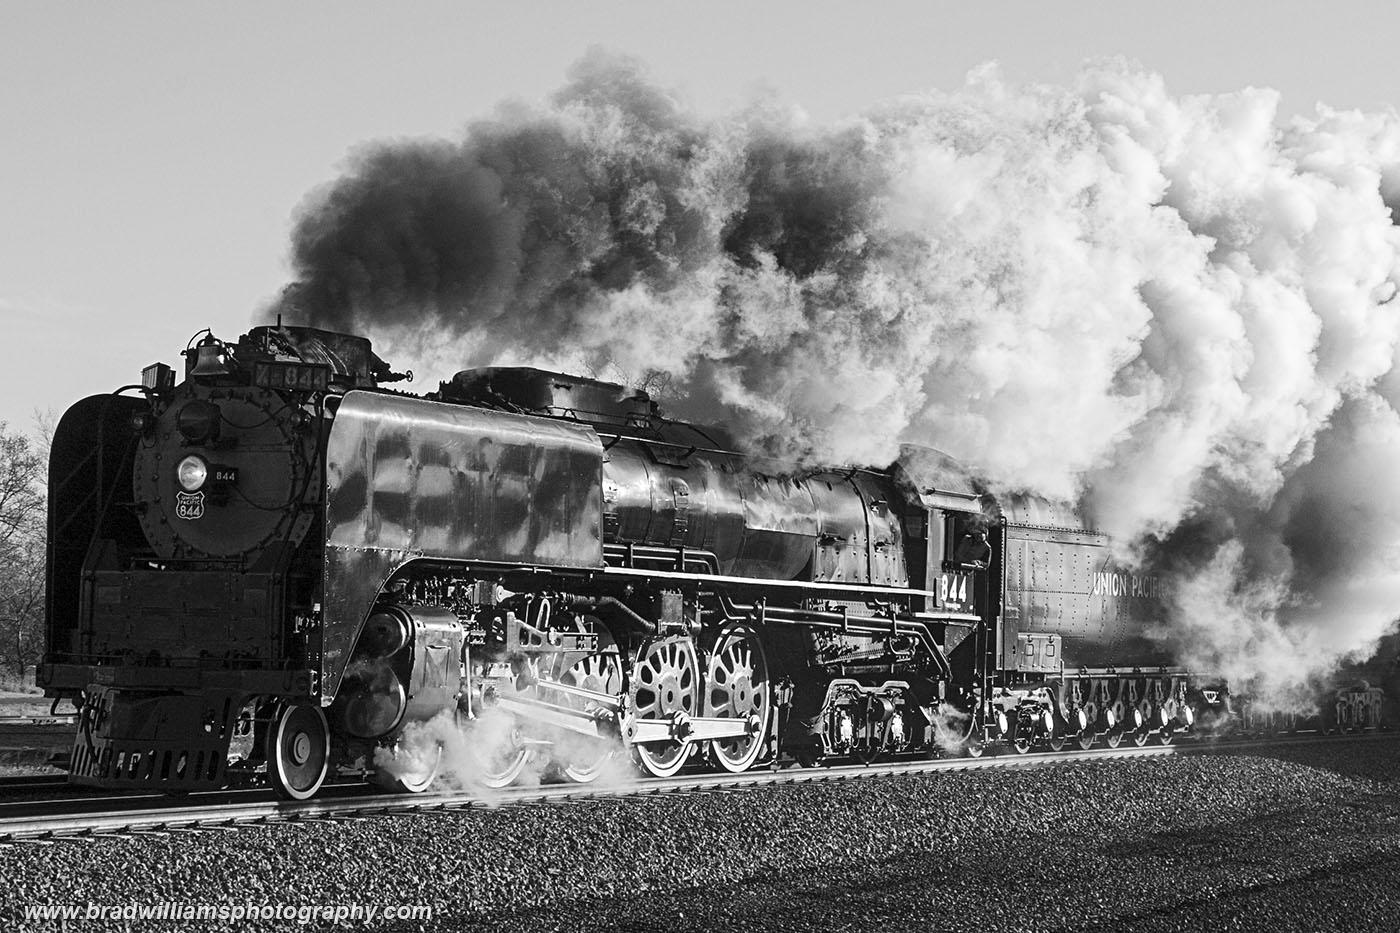 Union Pacific, 844, steam, locomotive